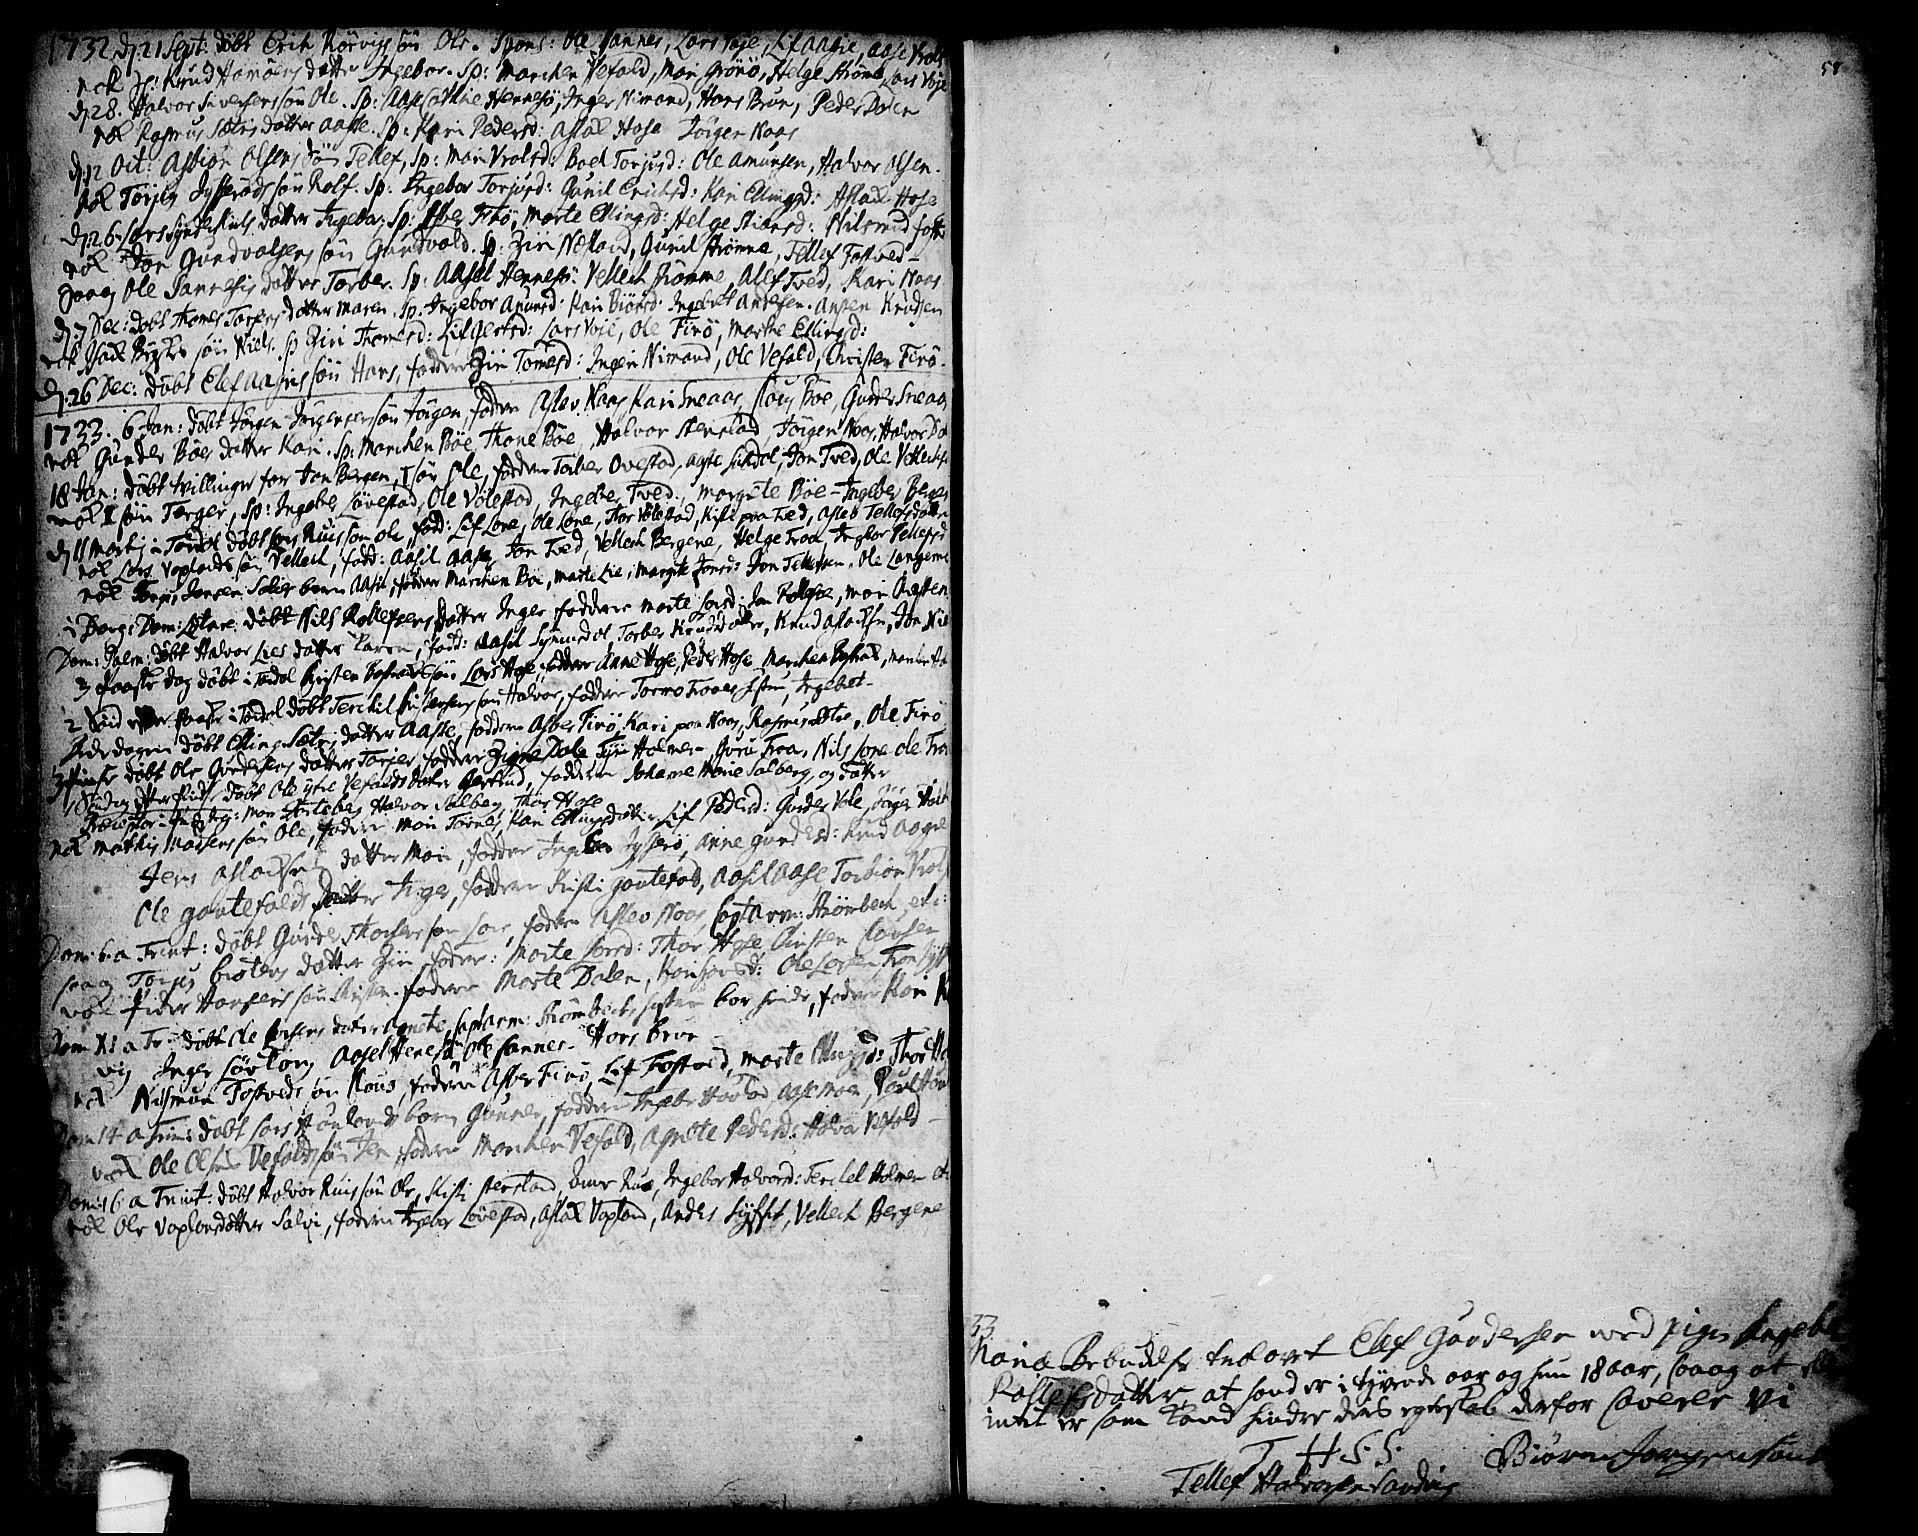 SAKO, Drangedal kirkebøker, F/Fa/L0001: Ministerialbok nr. 1, 1697-1767, s. 58